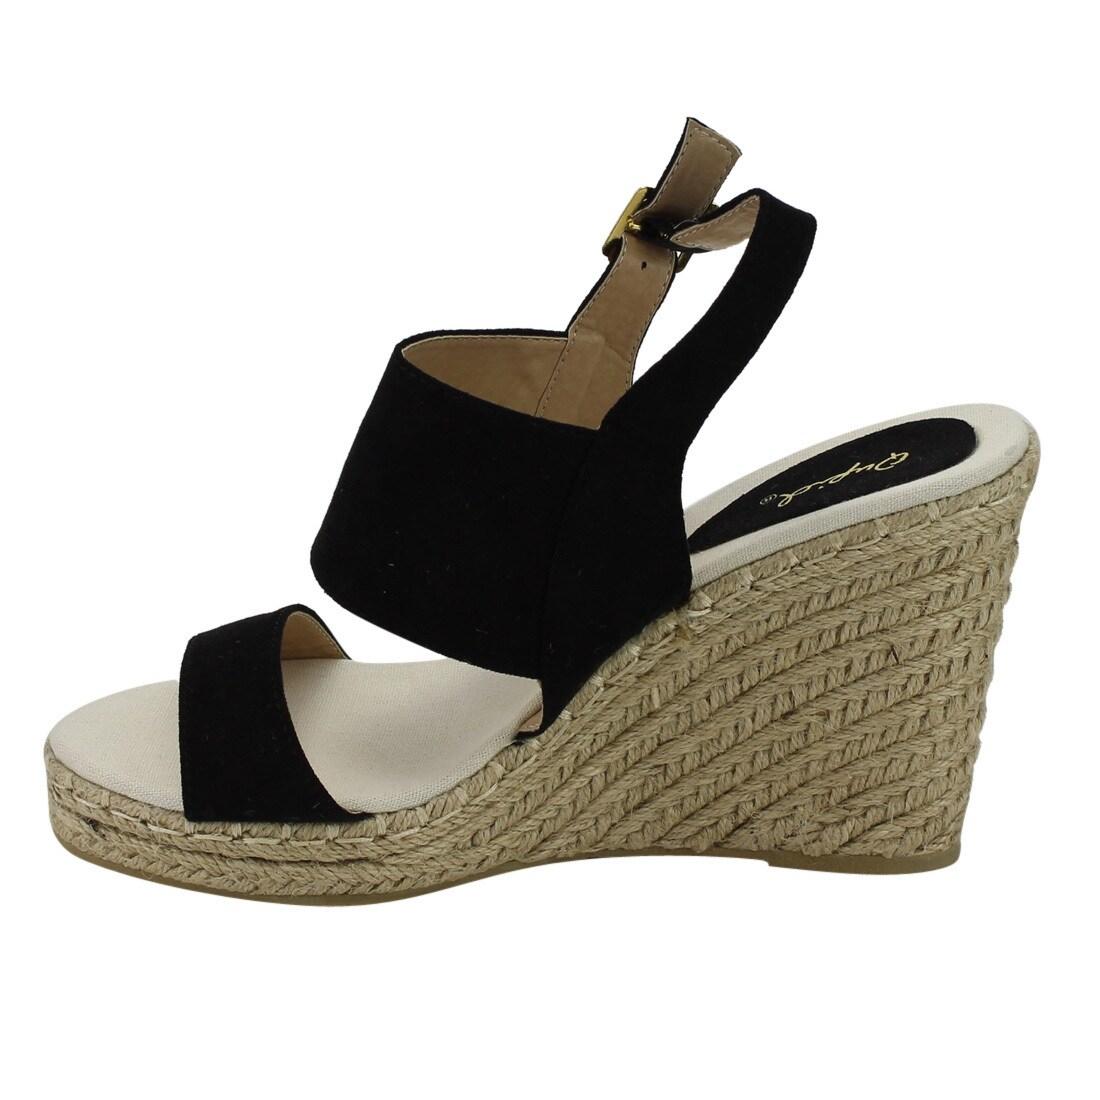 e52993a9e39 QUPID FG61 Women's Slingback Stitched Espadrille Platform Wedge Sandals